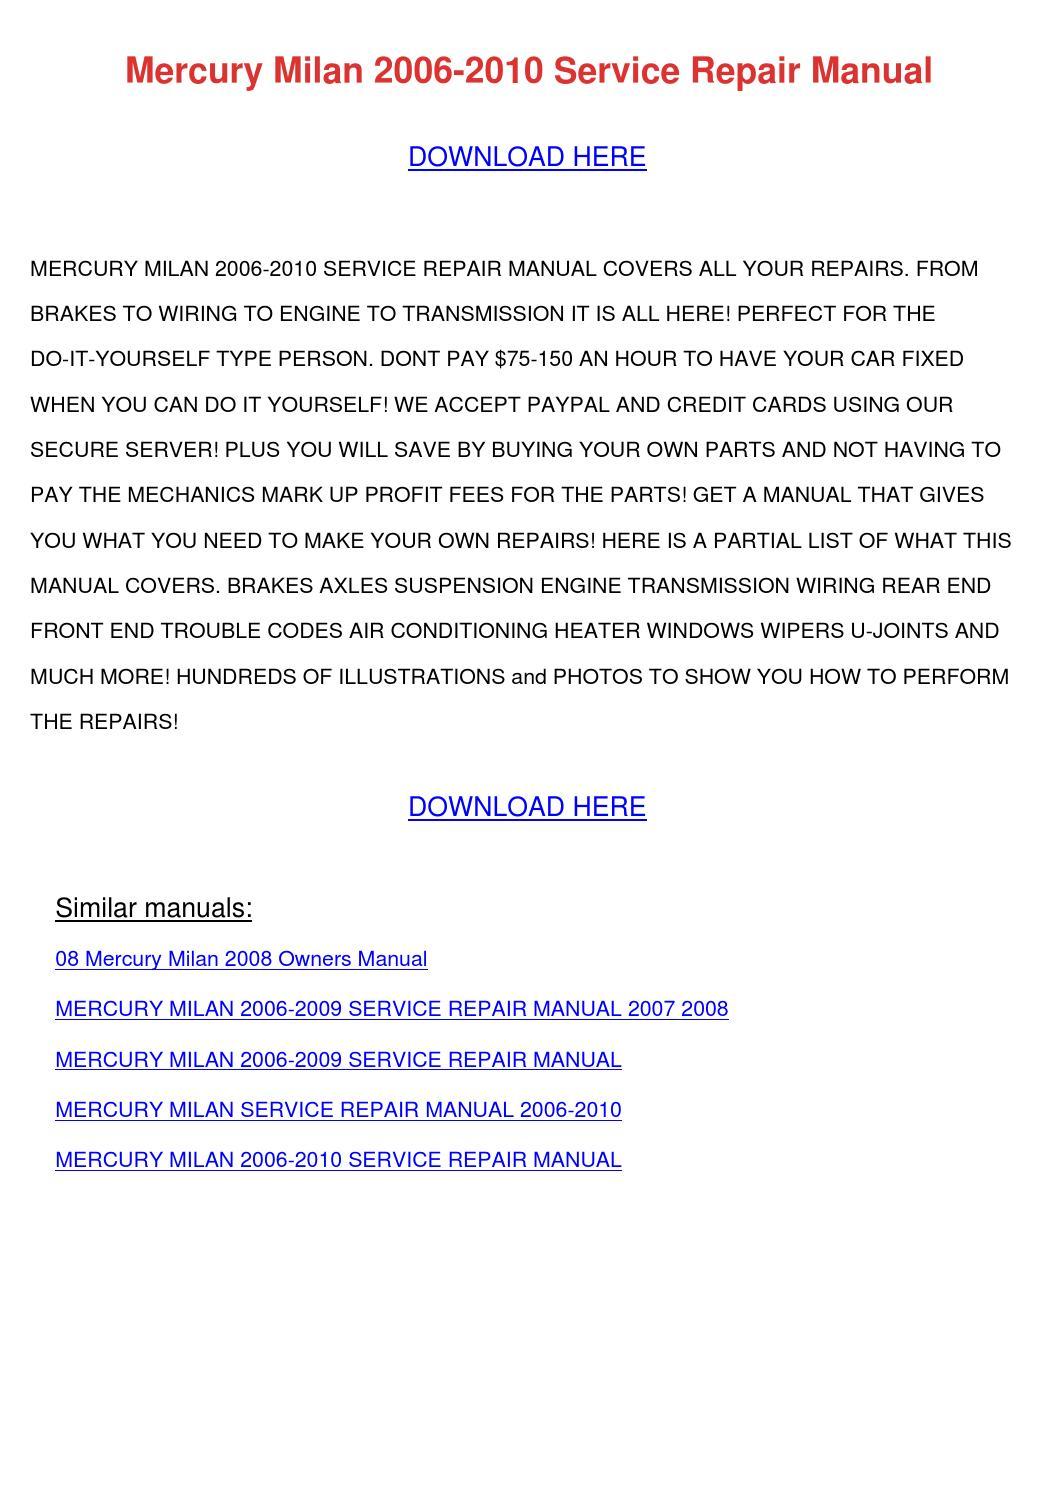 2007 Mercury Milan Hand Manual Pdf Download Engine Diagram Farebox Recovery Ratio Wikipedia